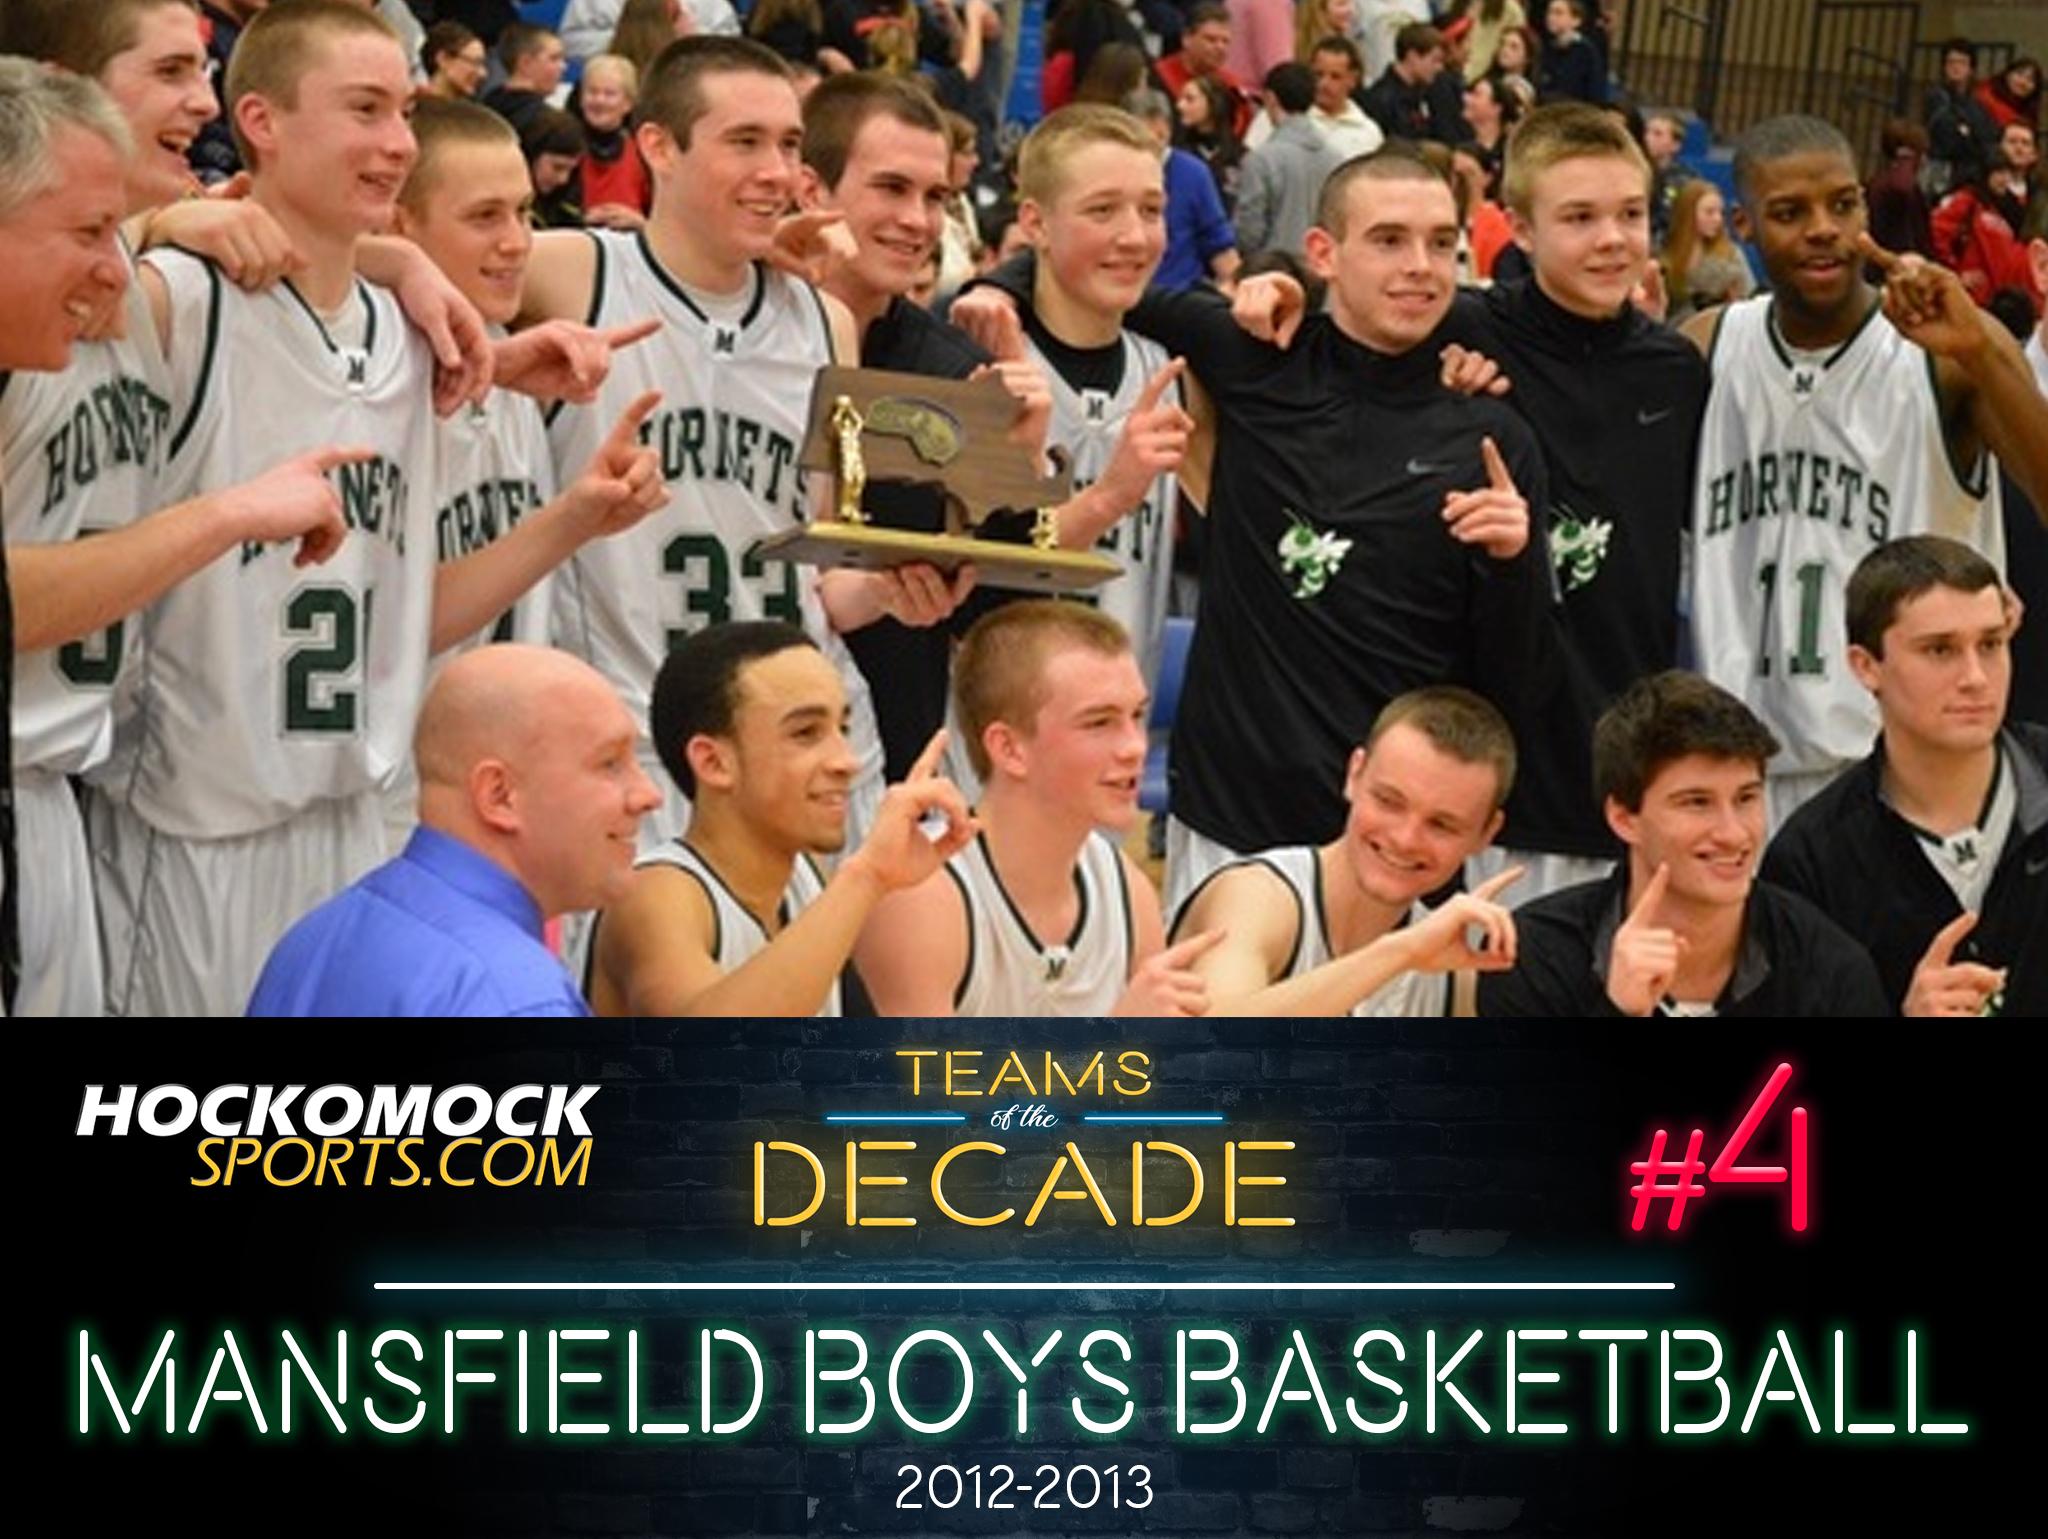 Mansfield boys basketball